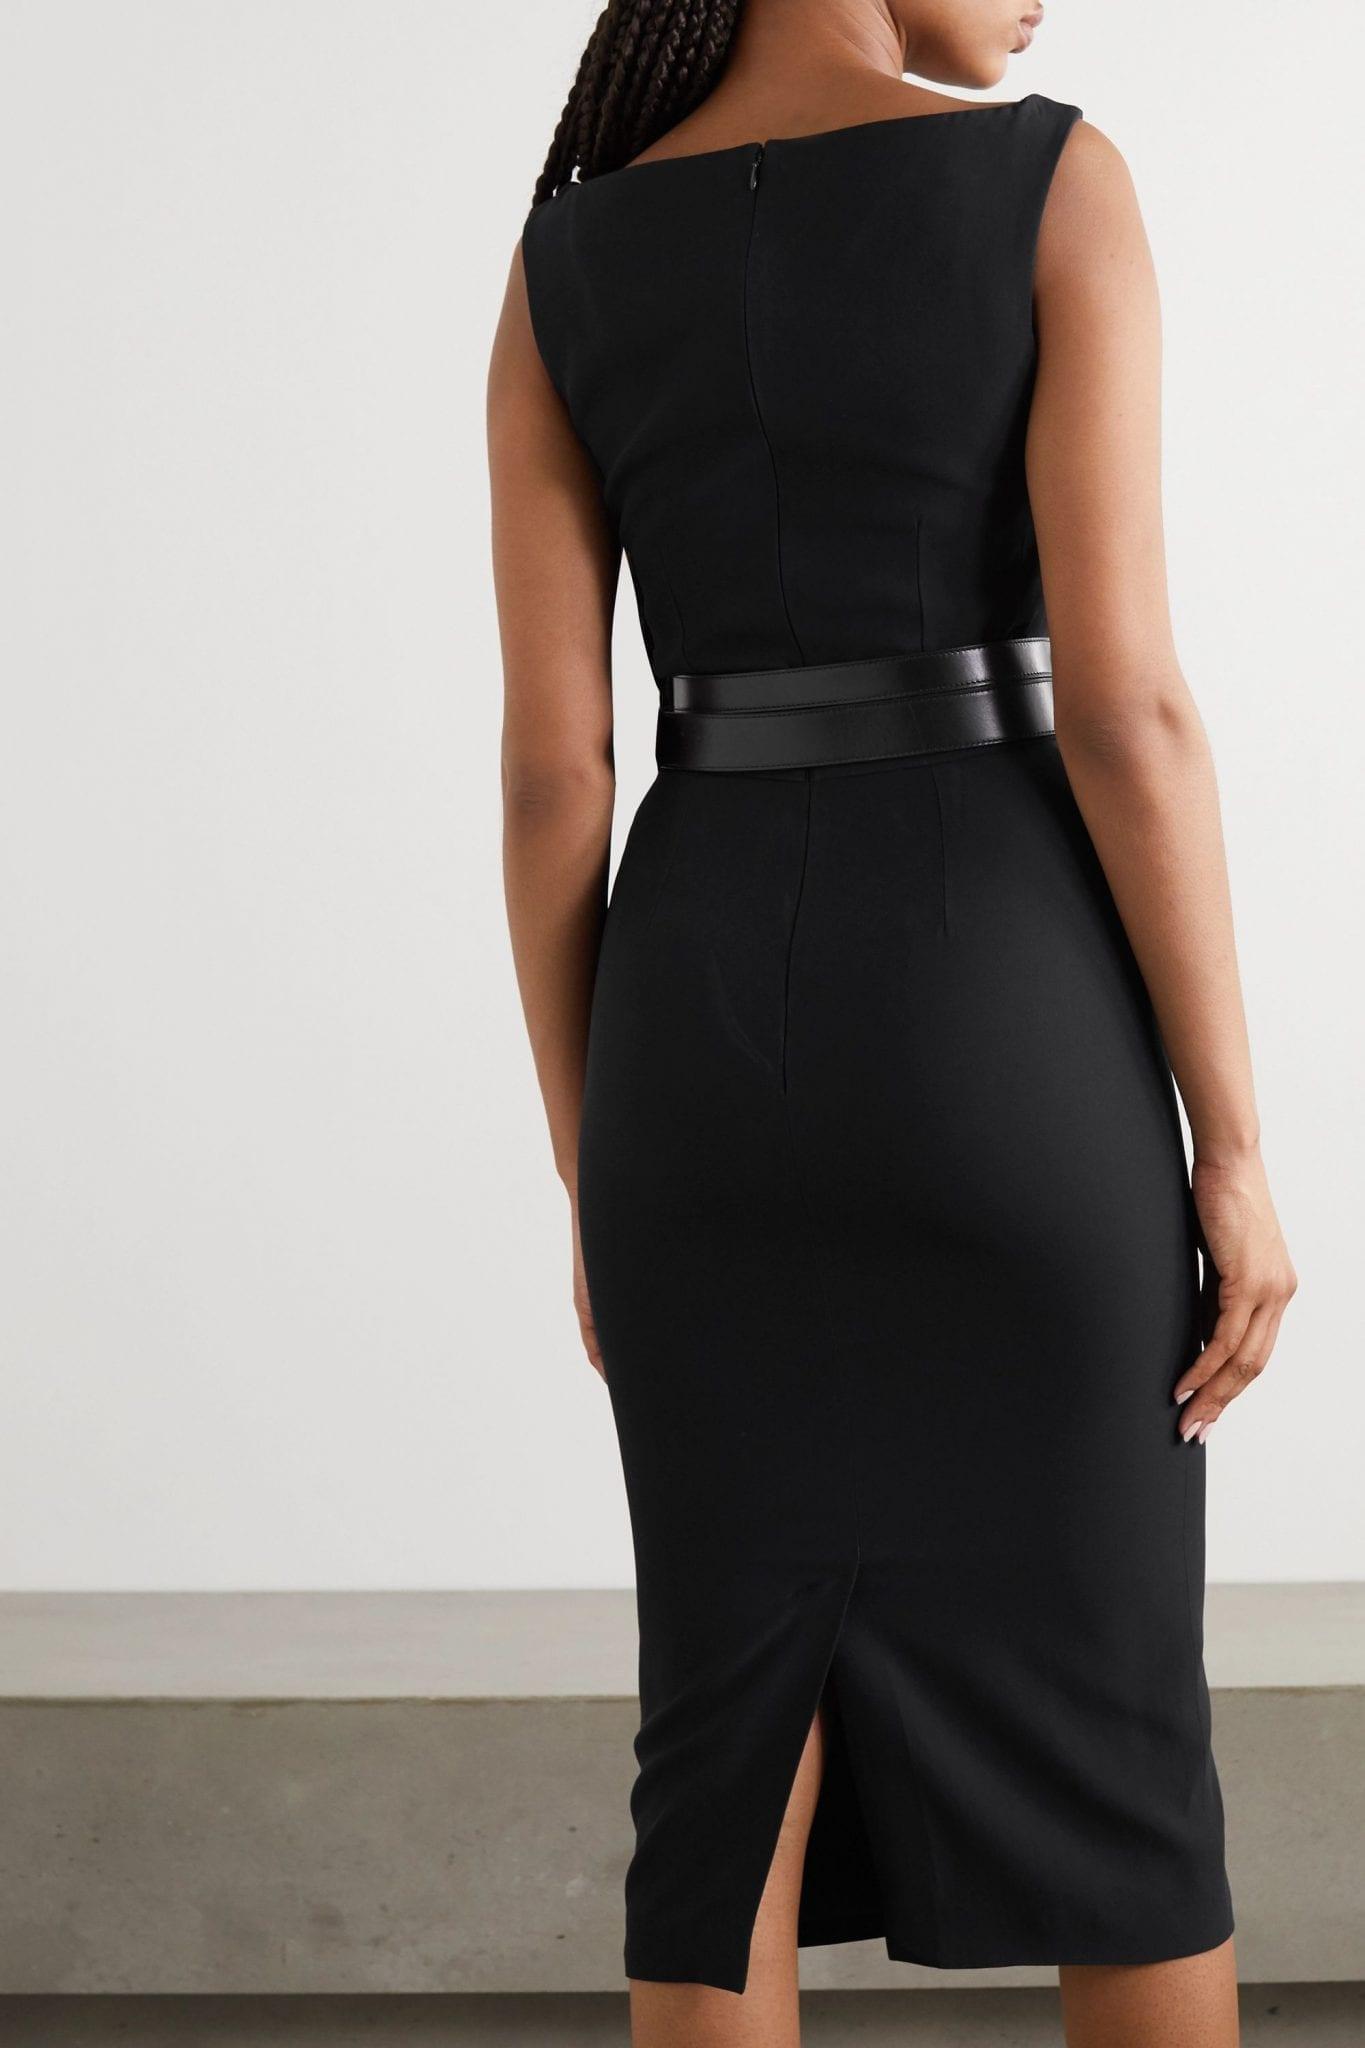 ALEXANDER MCQUEEN Crepe Midi Dress